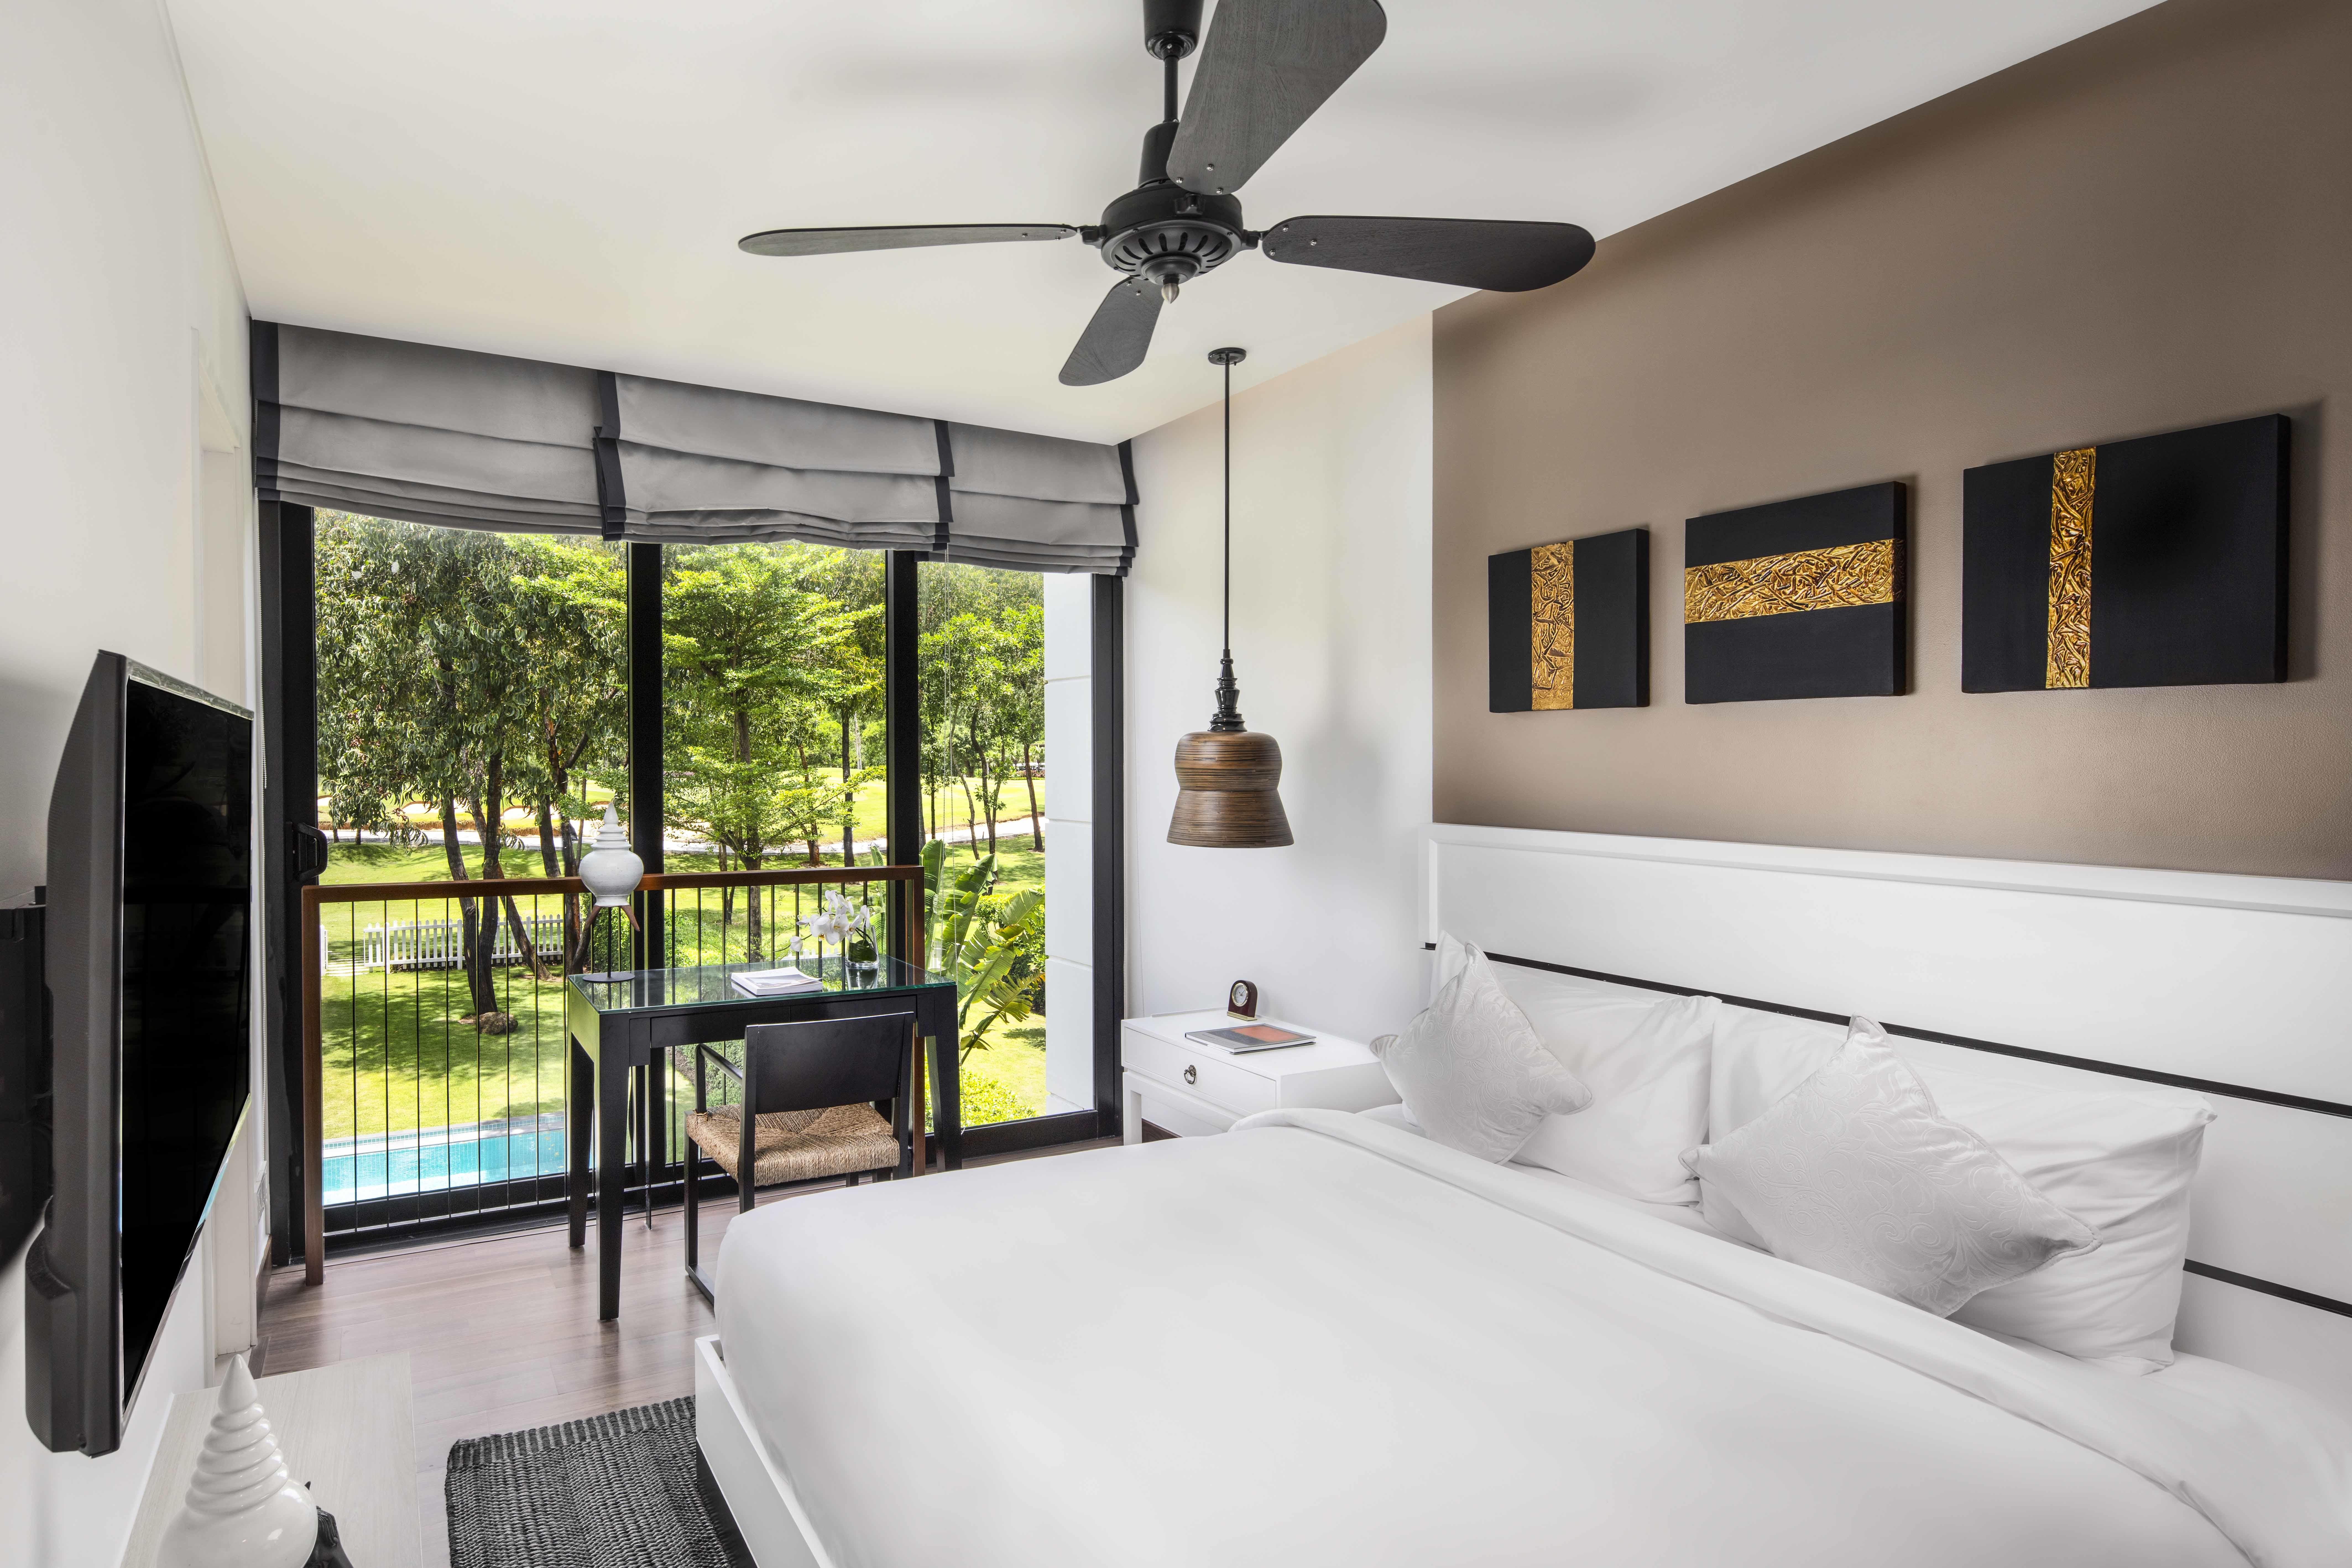 Three-bedroom Pool Towhouse